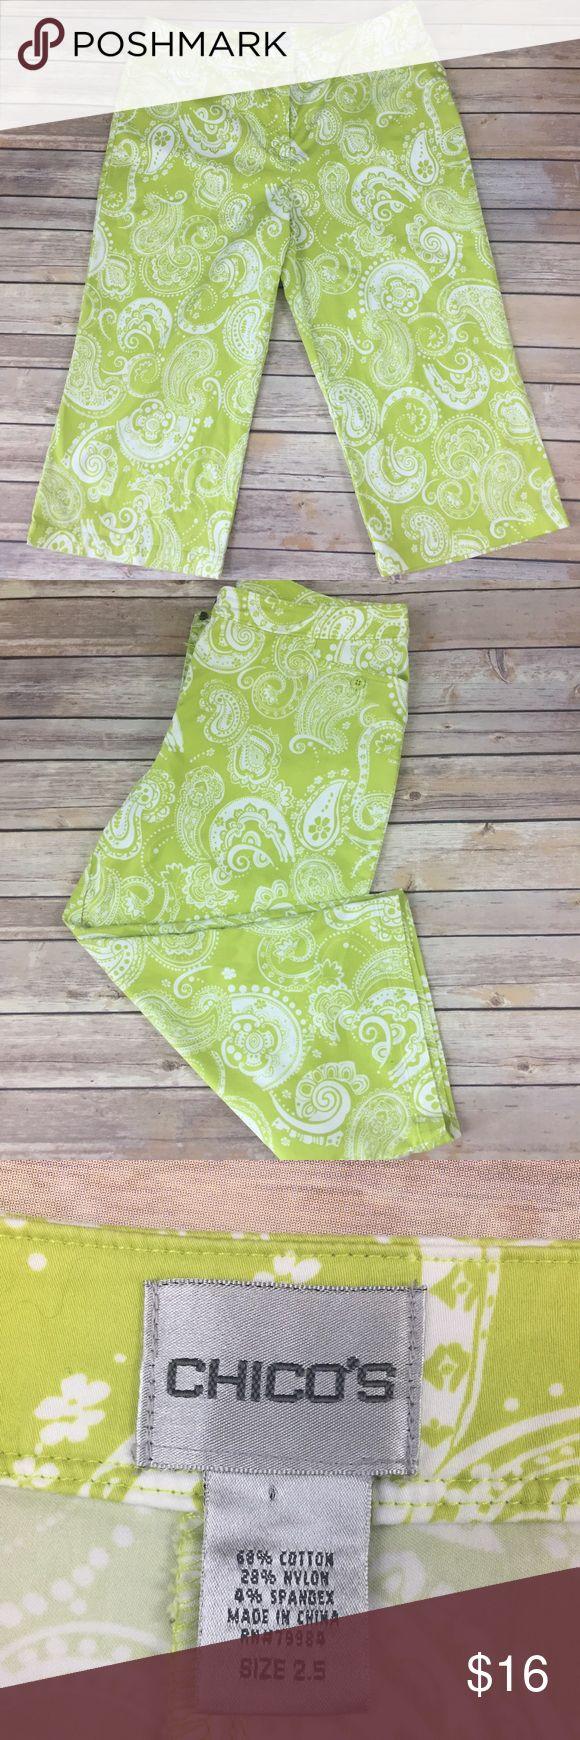 "Chicos Paisley Capri Cropped Pants Lime Green 2.5 Chicos cropped pants in a lime green Paisley pattern. Excellent condition, size 2.5. Flat lay measurements: Waist 17.5"" Inseam 20"" Outseam 30.5"".   A25xp Chico's Pants Capris"